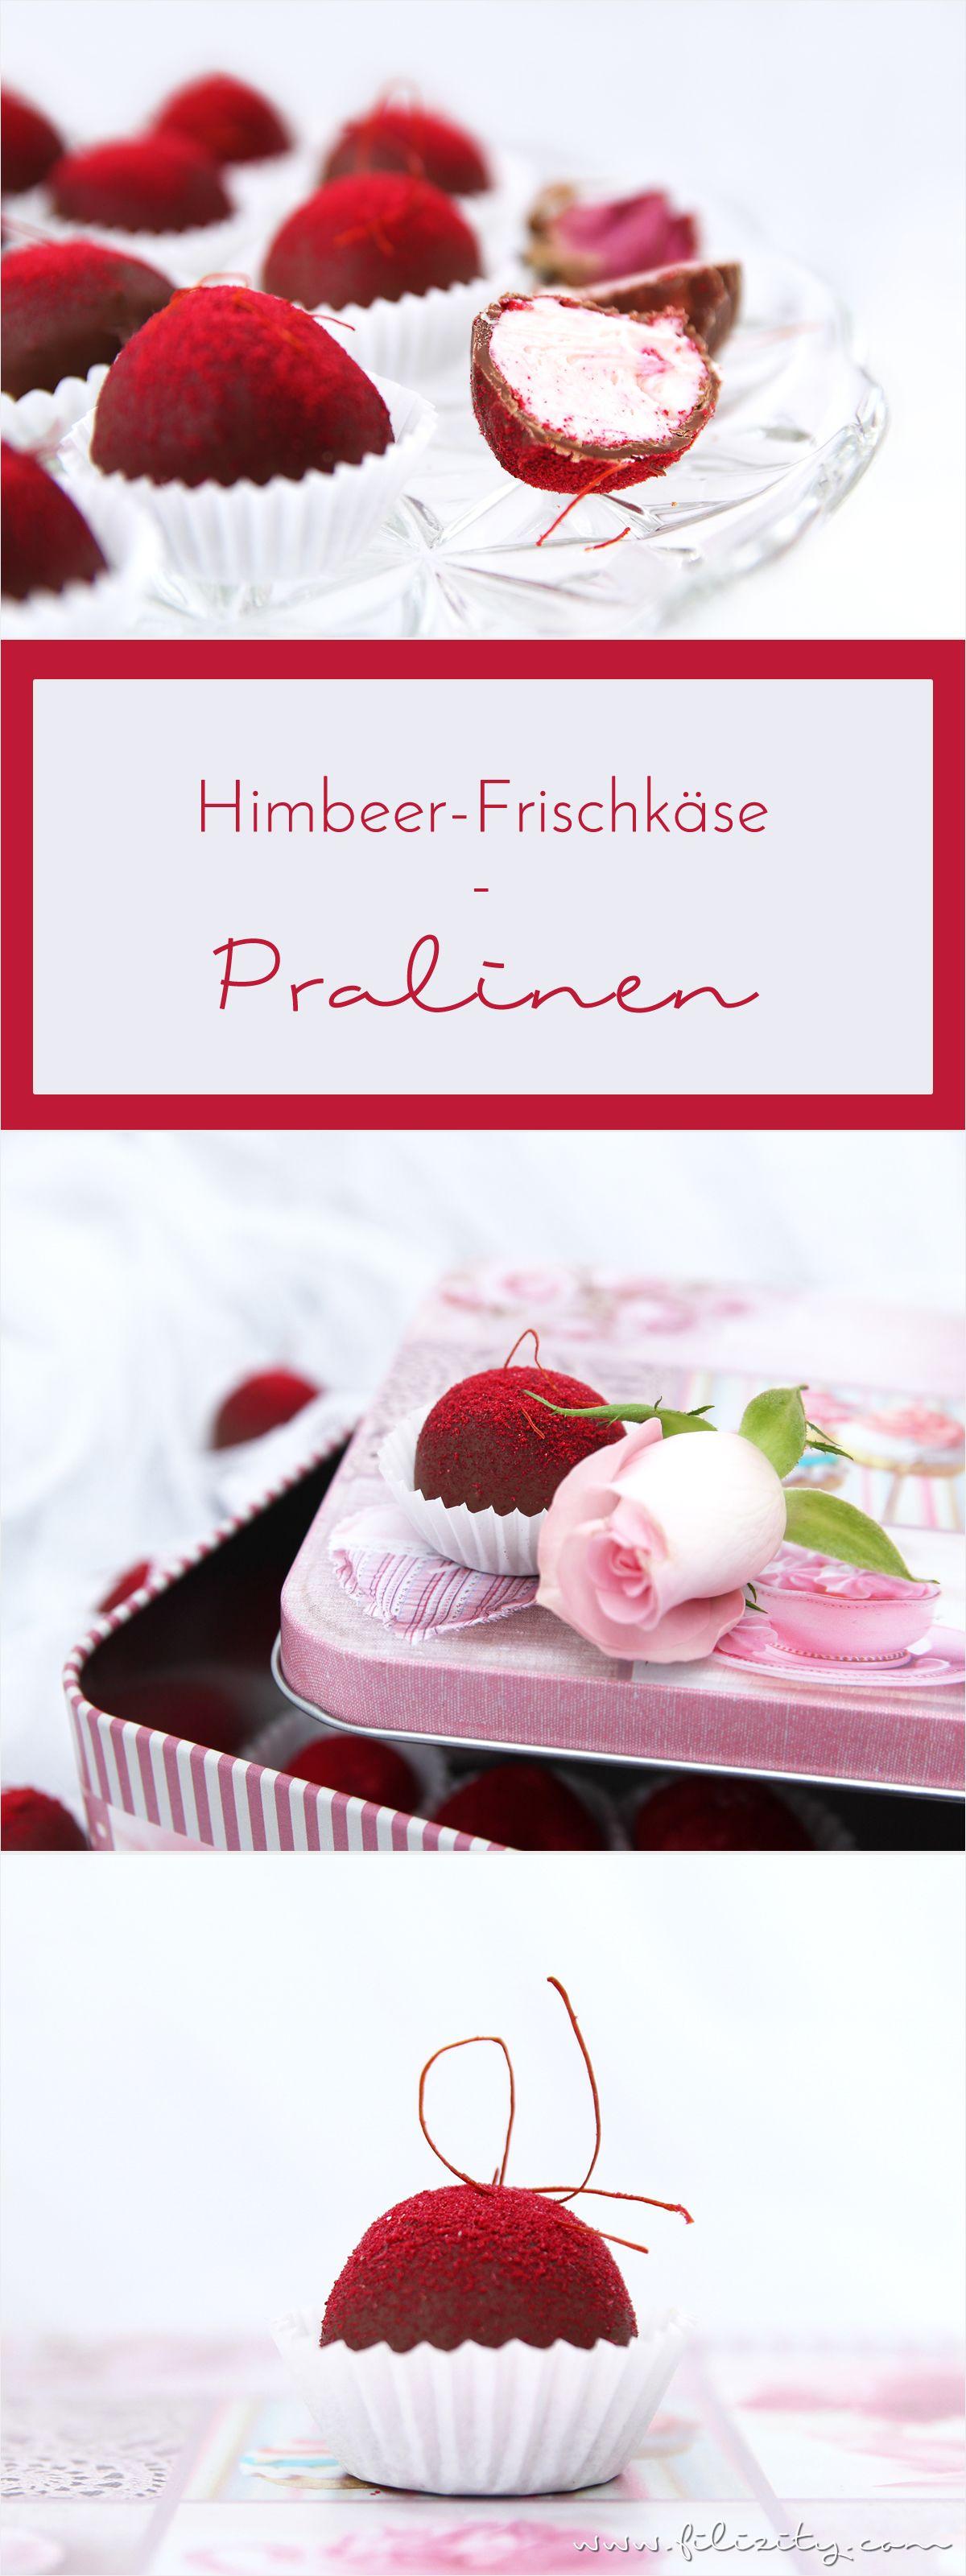 Himbeer-Pralinen: Schokoladige Liebesgeschenke mit Vitamix #fooddiy